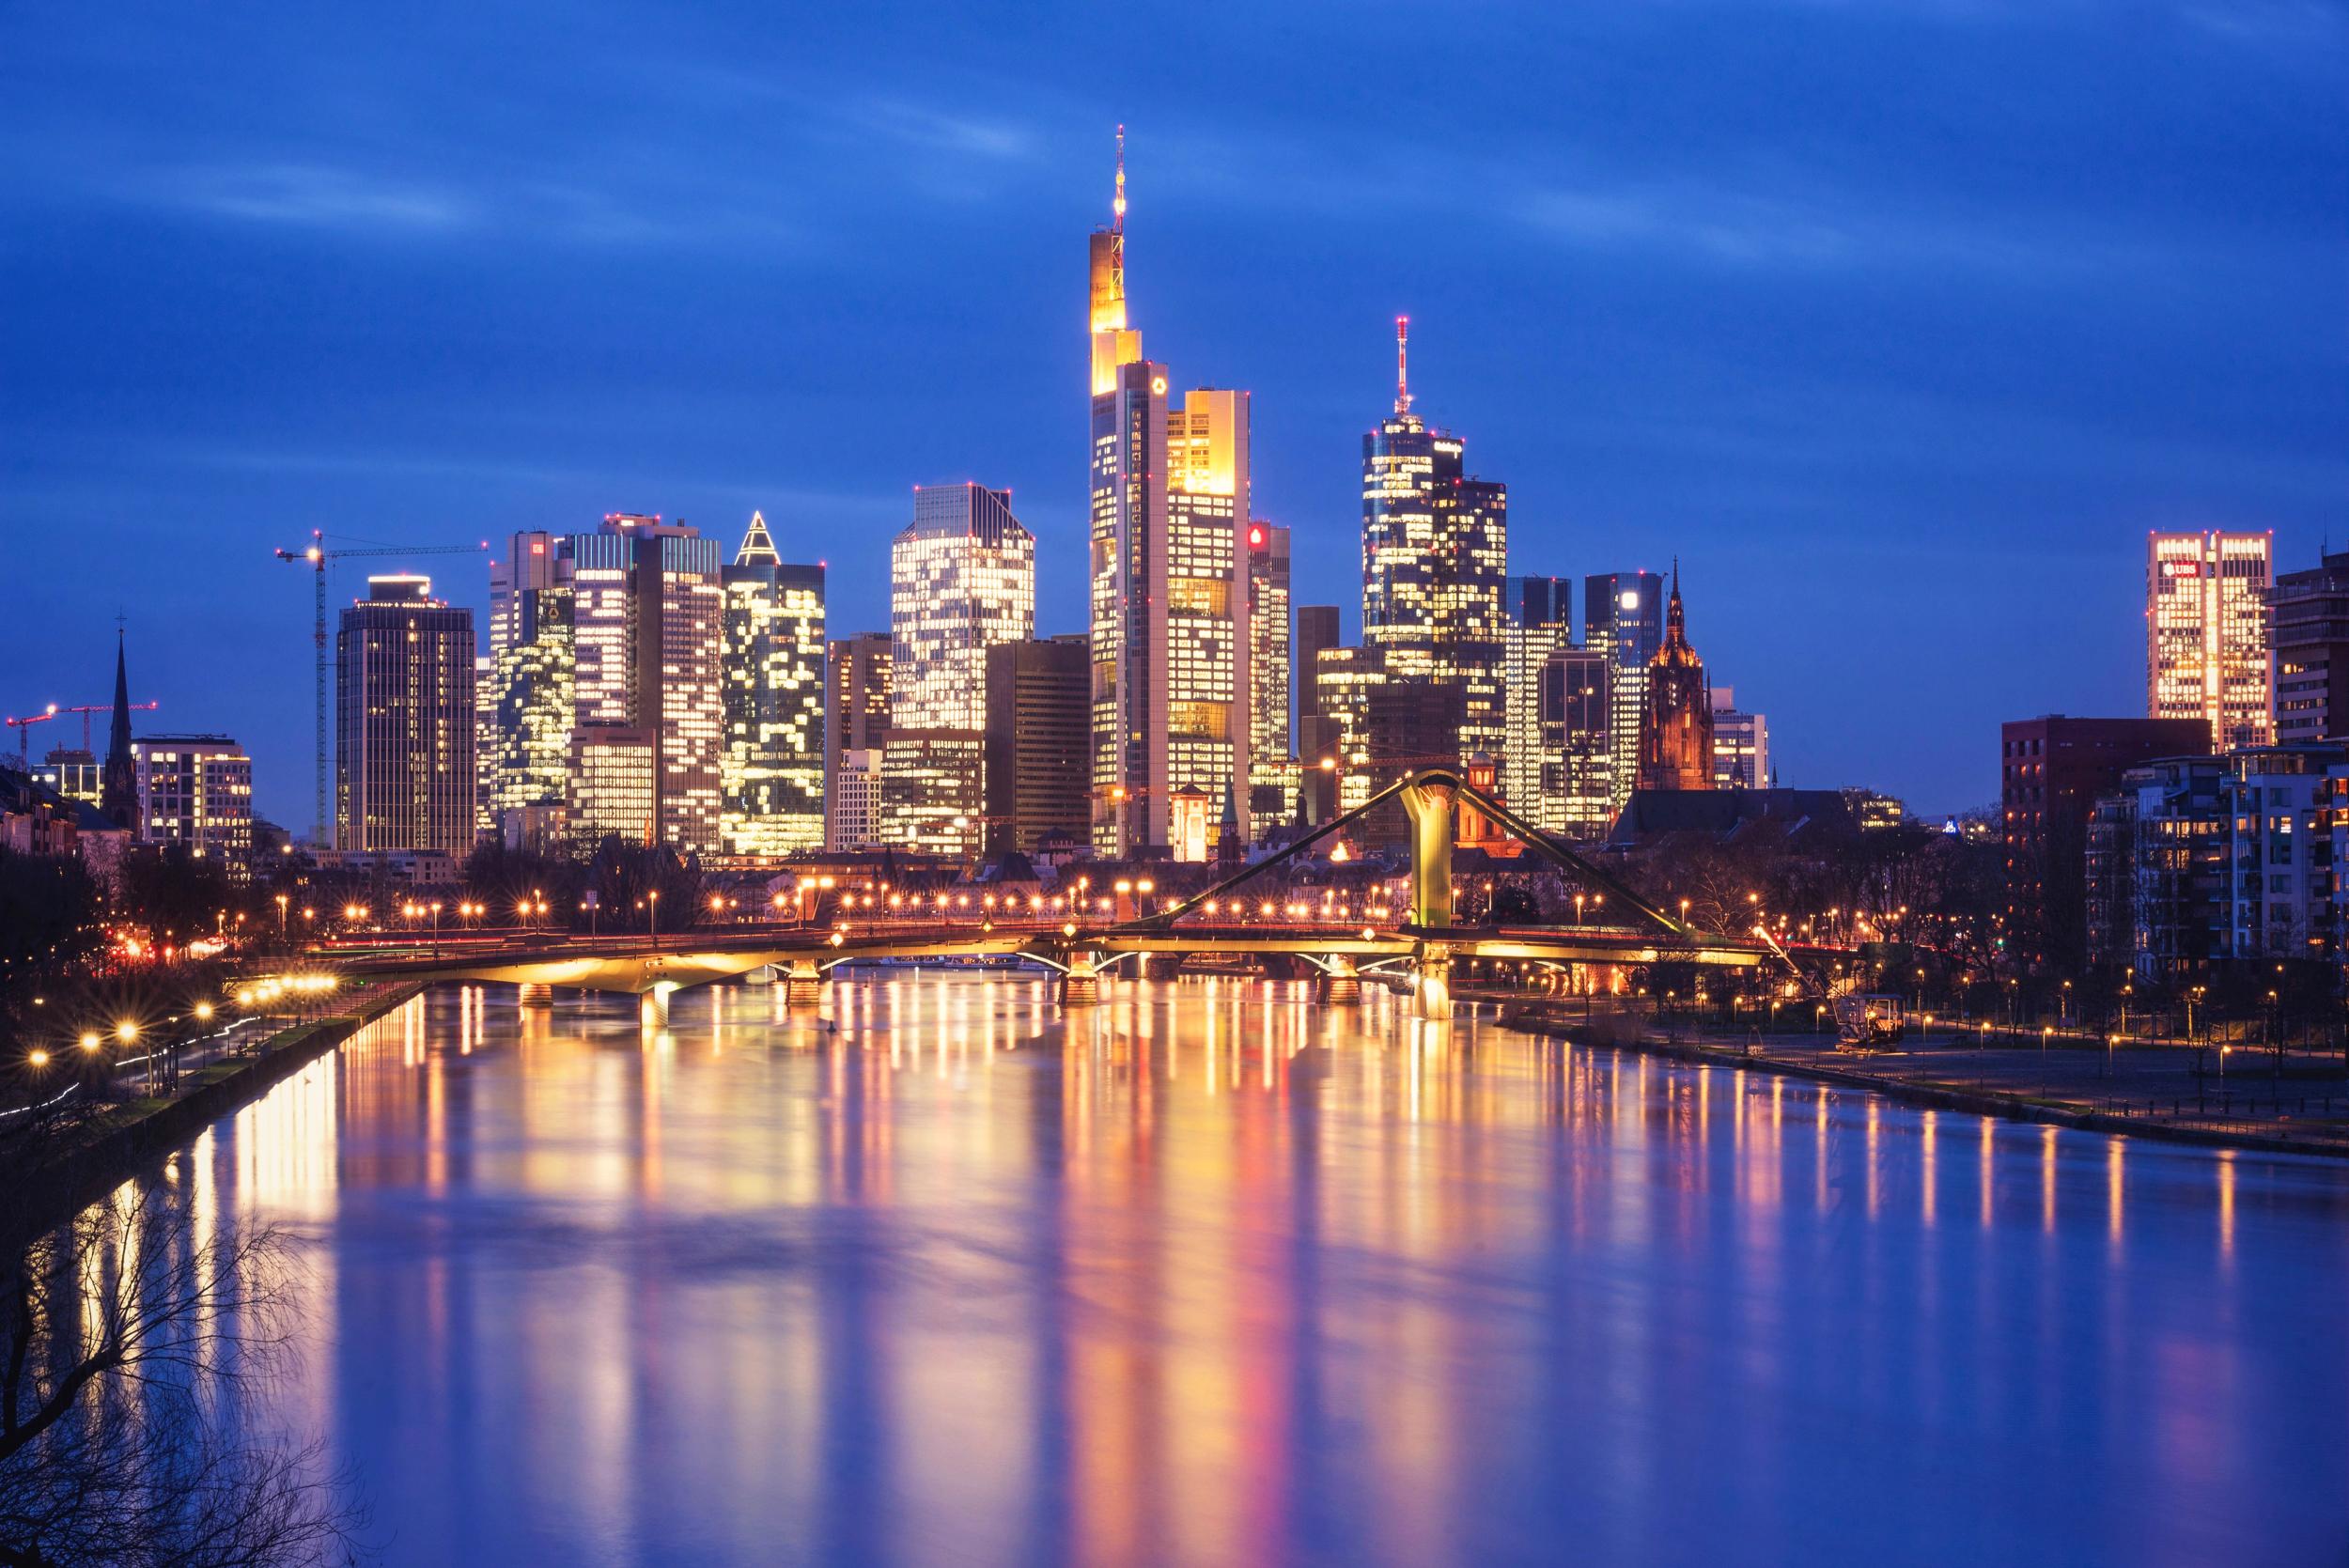 Frankfurt City at blue hour